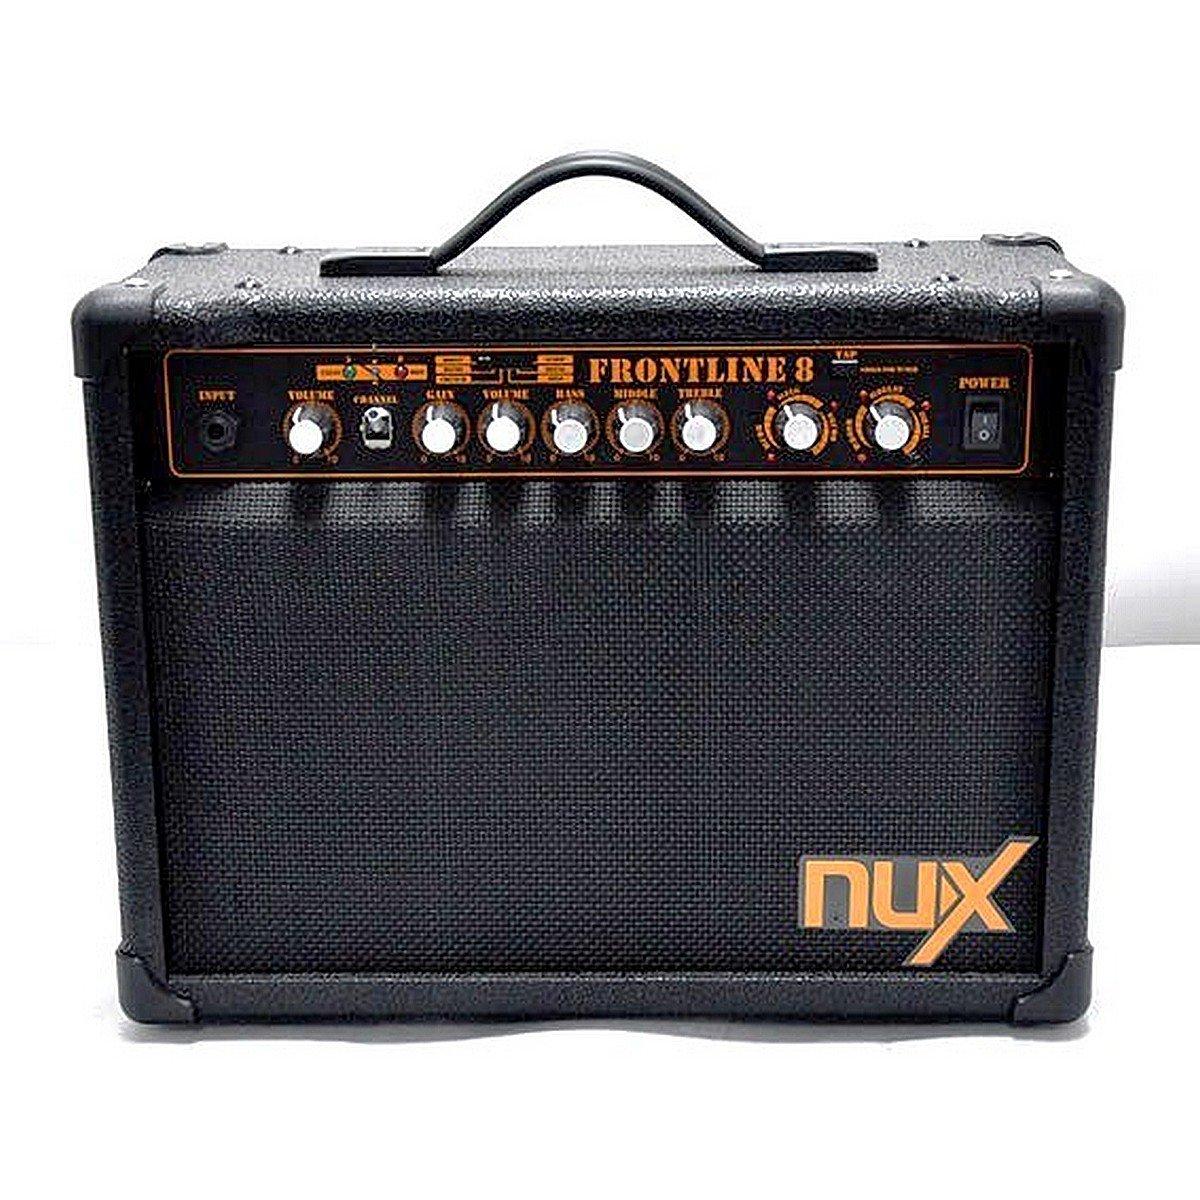 NUX Frontline 8 Electric Guitar Amplifier 8-Watt Clean and Distortion